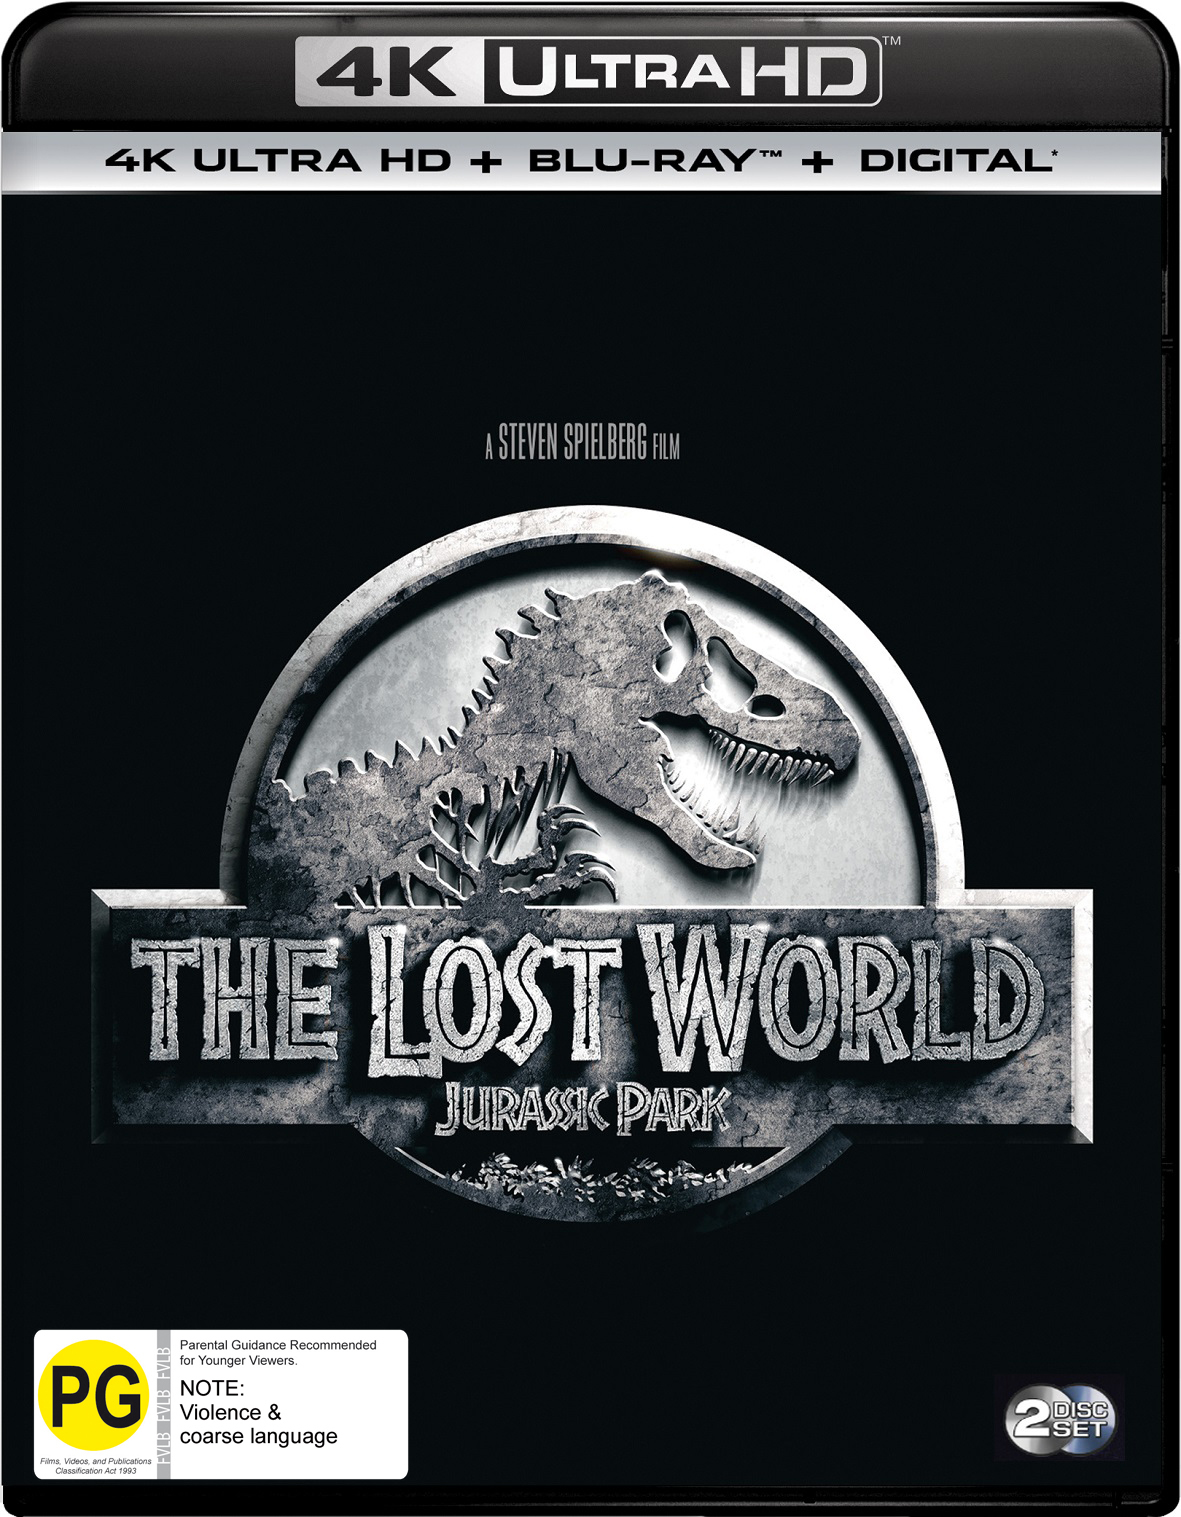 Jurassic Park II - The Lost World on UHD Blu-ray image